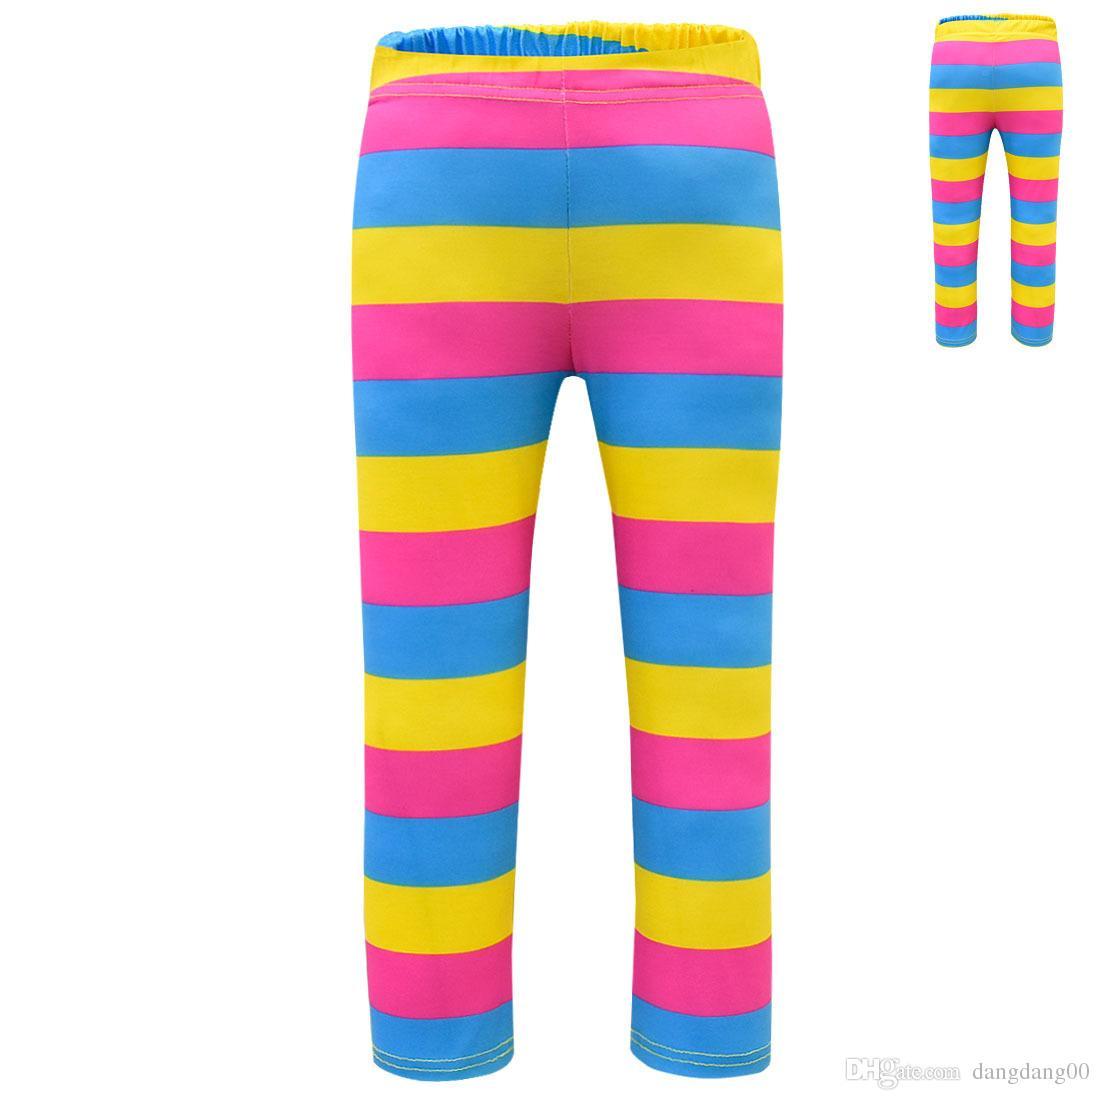 New kids pants beautiful Nancy cos girl rainbow striped leggings